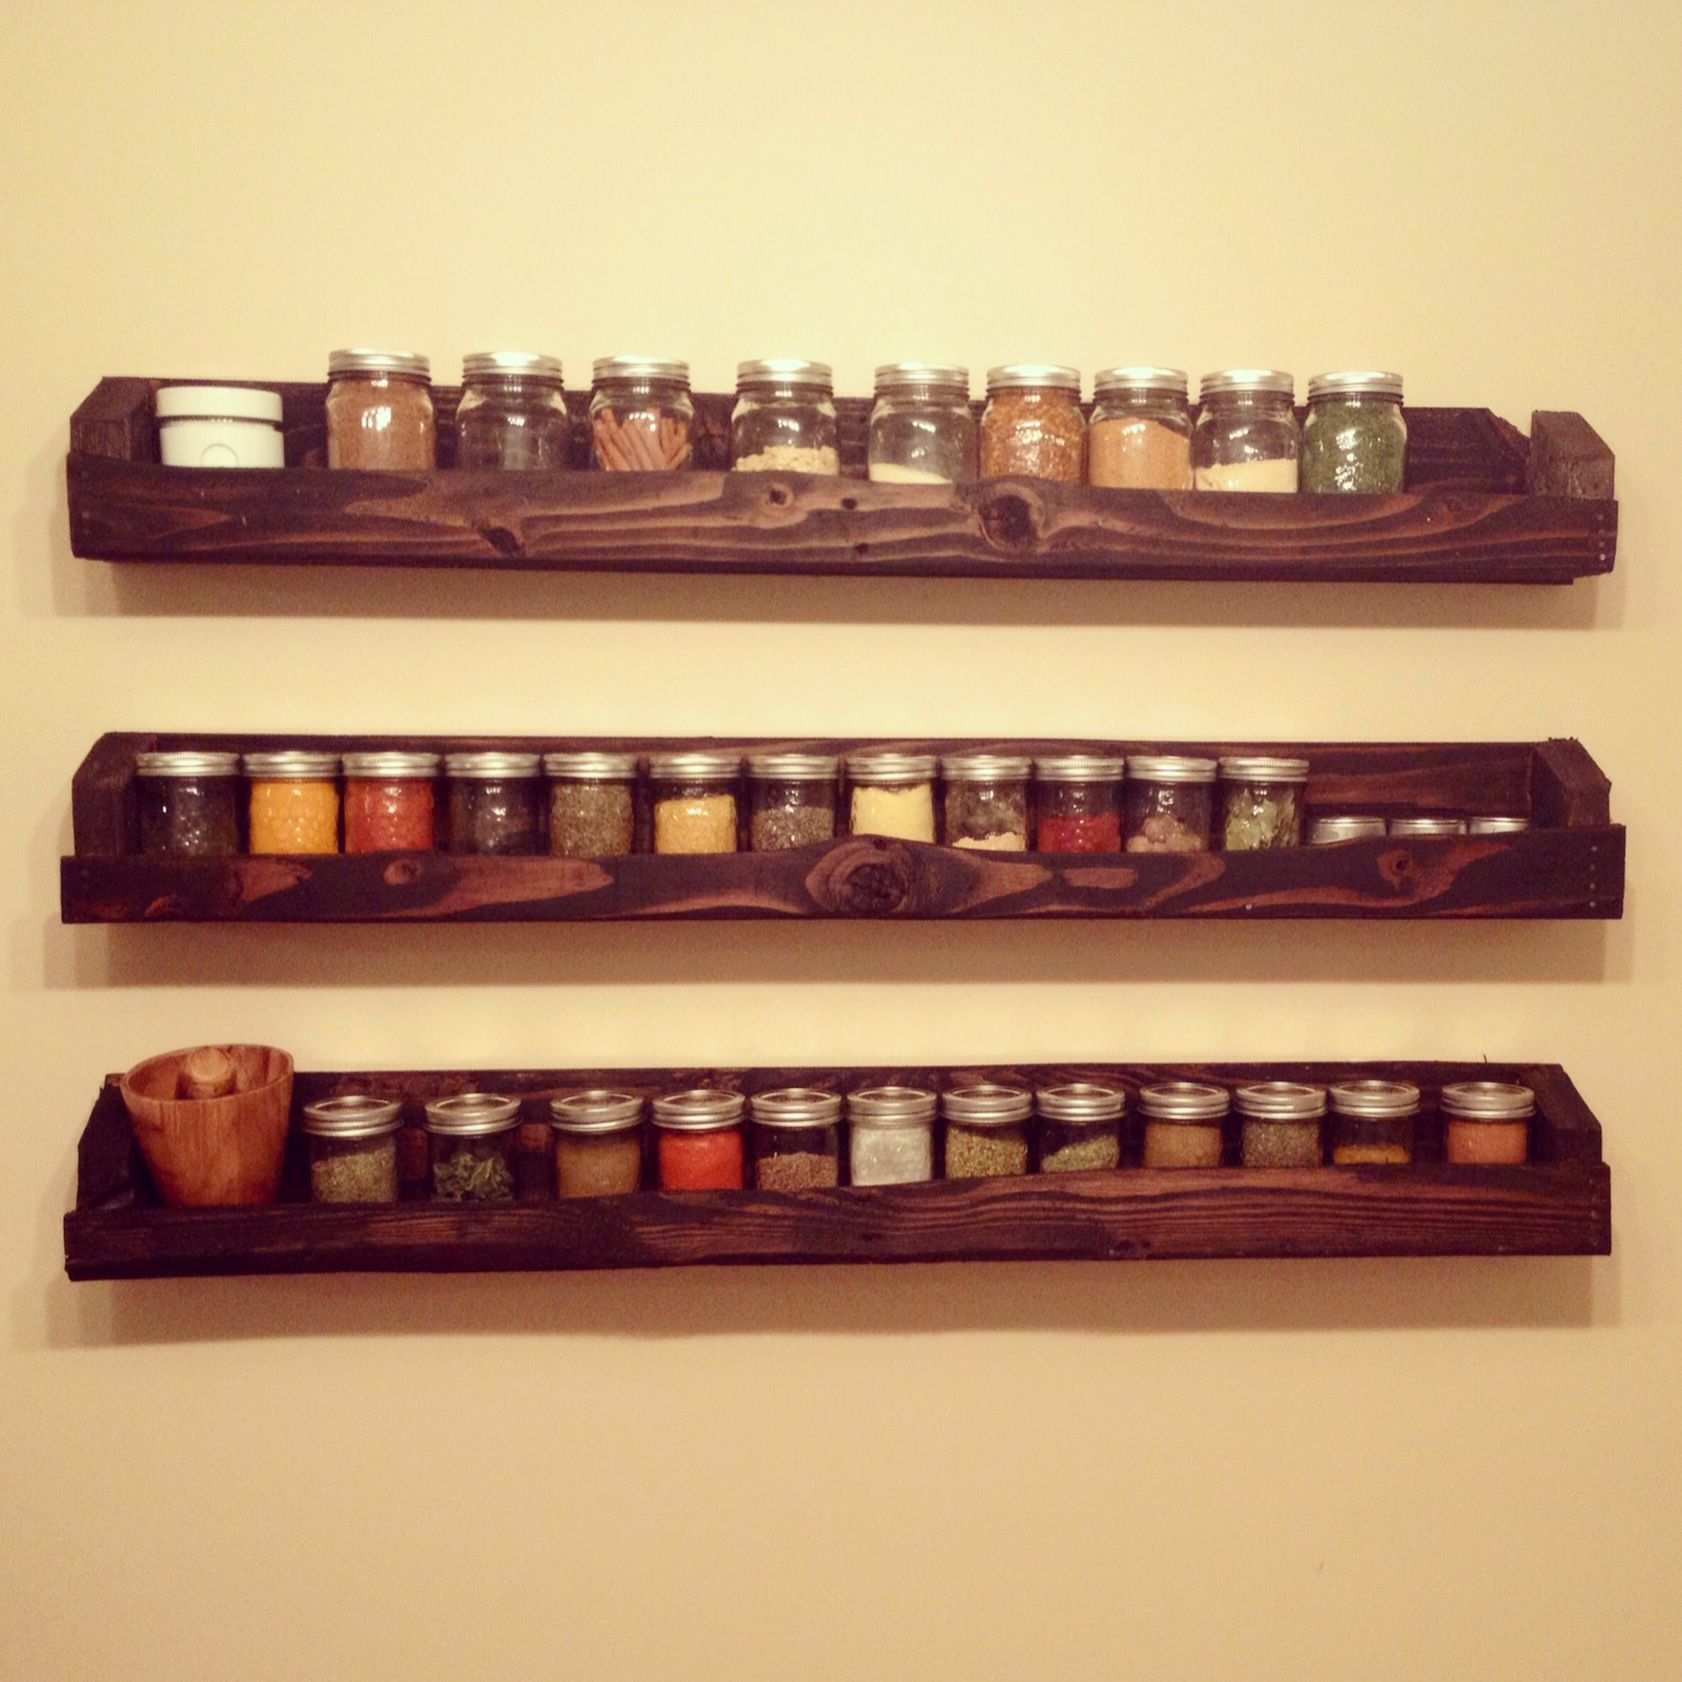 Pallet and mason jar spice rack :) | Pallet fun!! | Pinterest ...